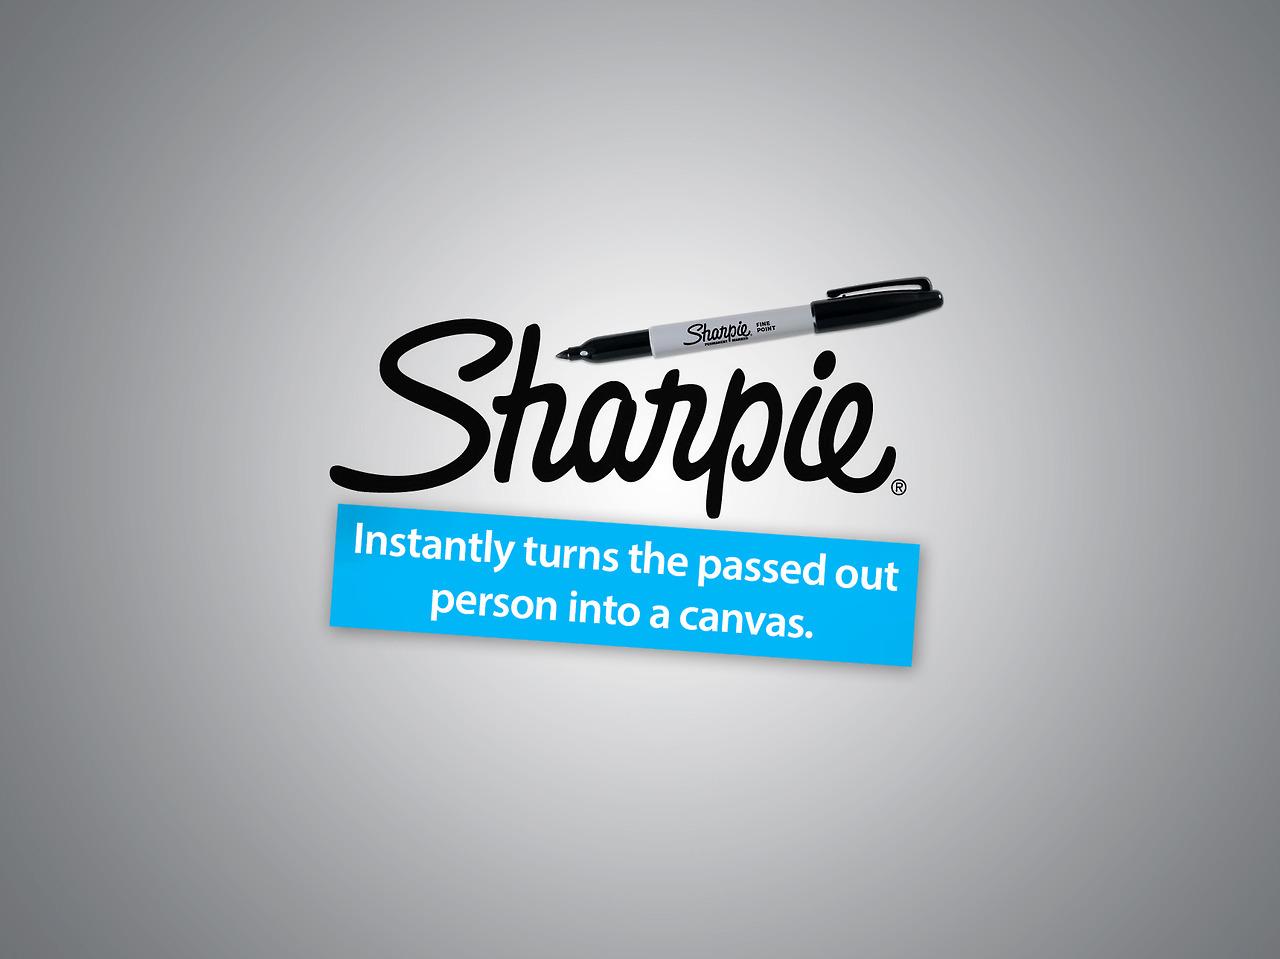 10 Funny Re- Written Advertising Slogans